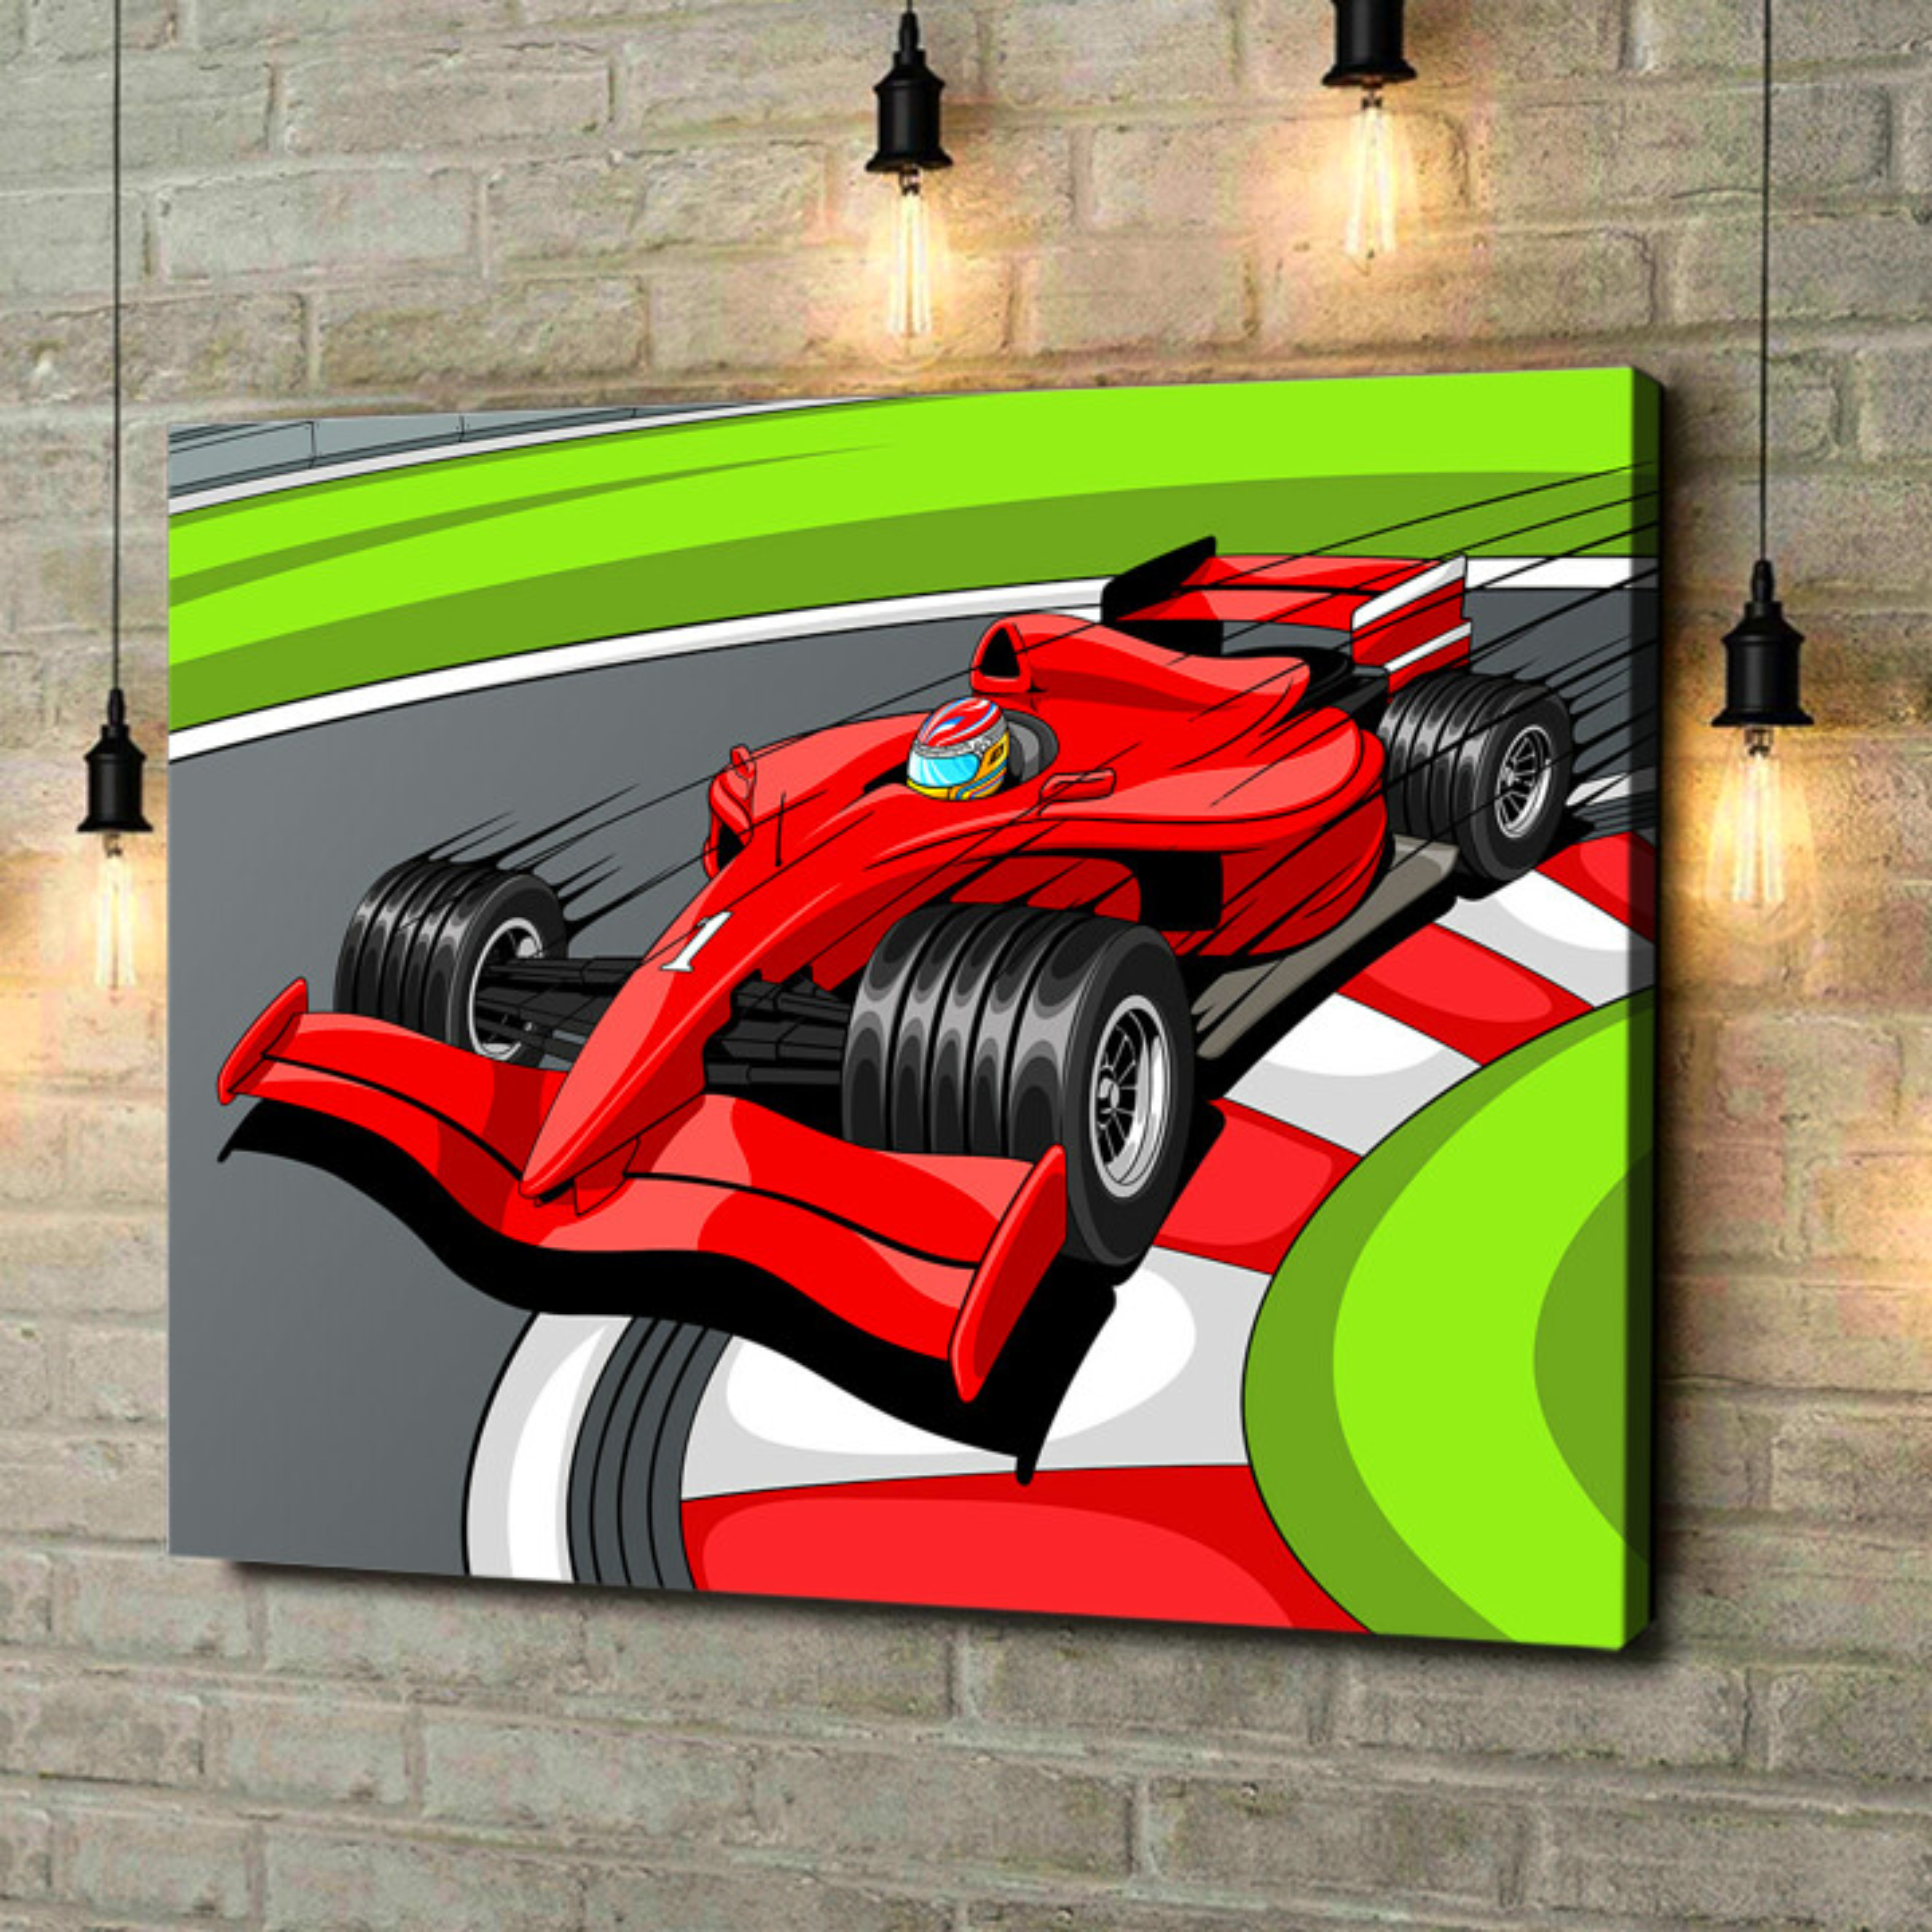 Leinwandbild personalisiert Formel 1 Rennwagen